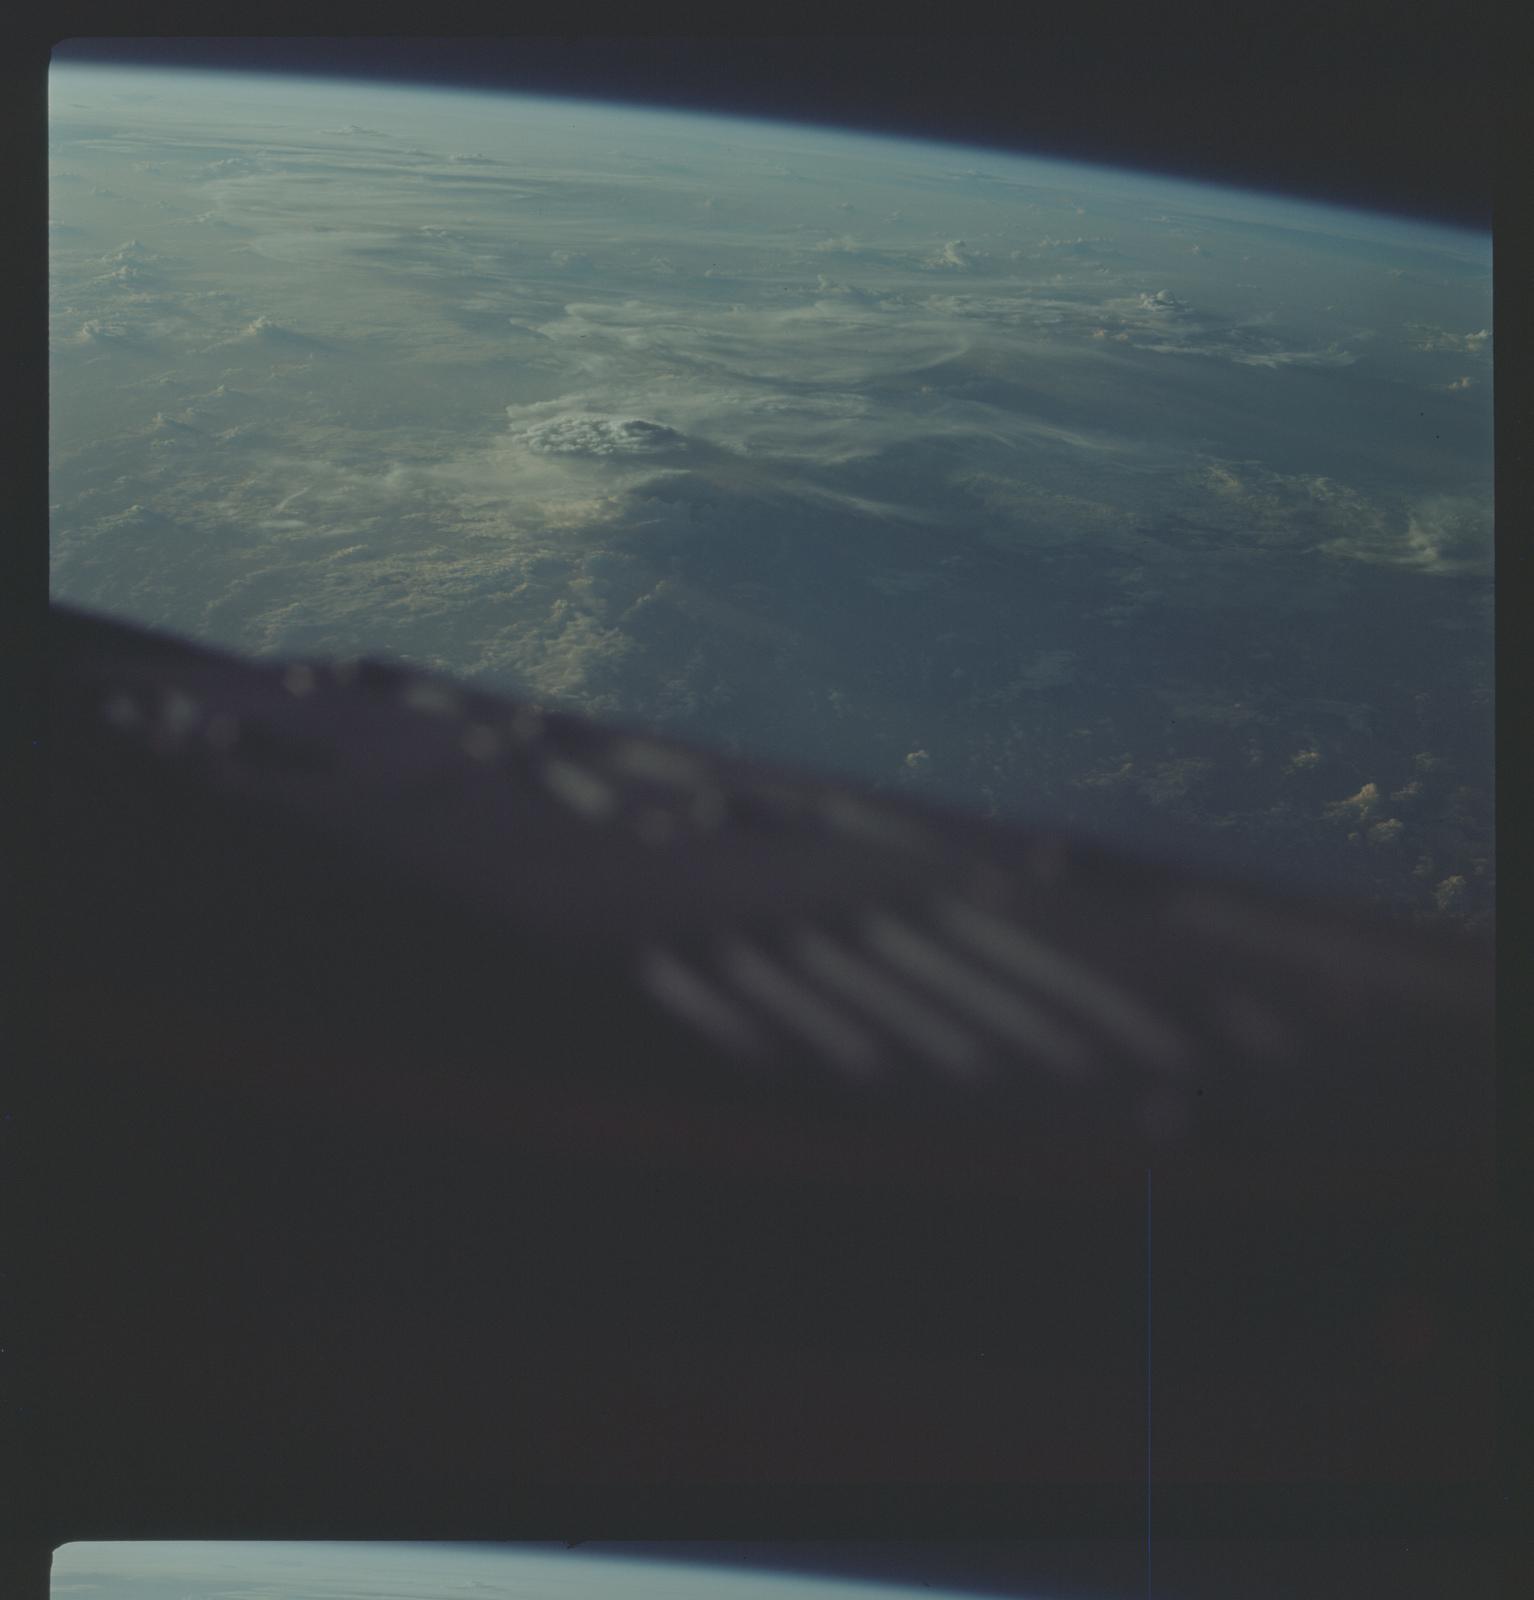 Gemini III Mission Image - Madagascar